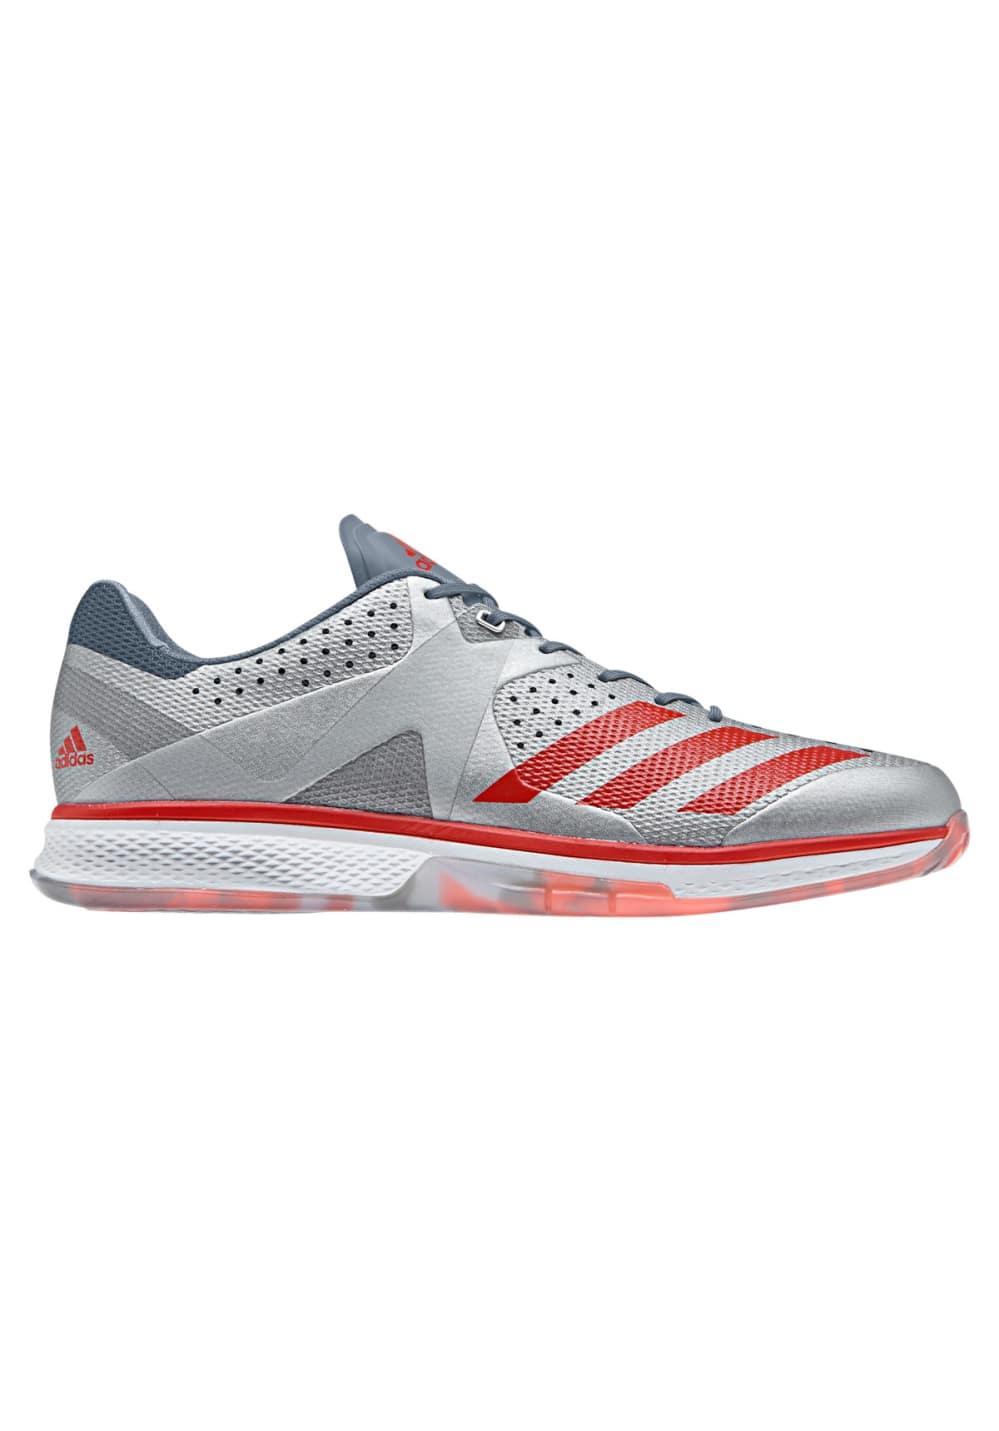 21run Pour Chaussures Homme Argent Handball Adidas Counterblast p8Sq77